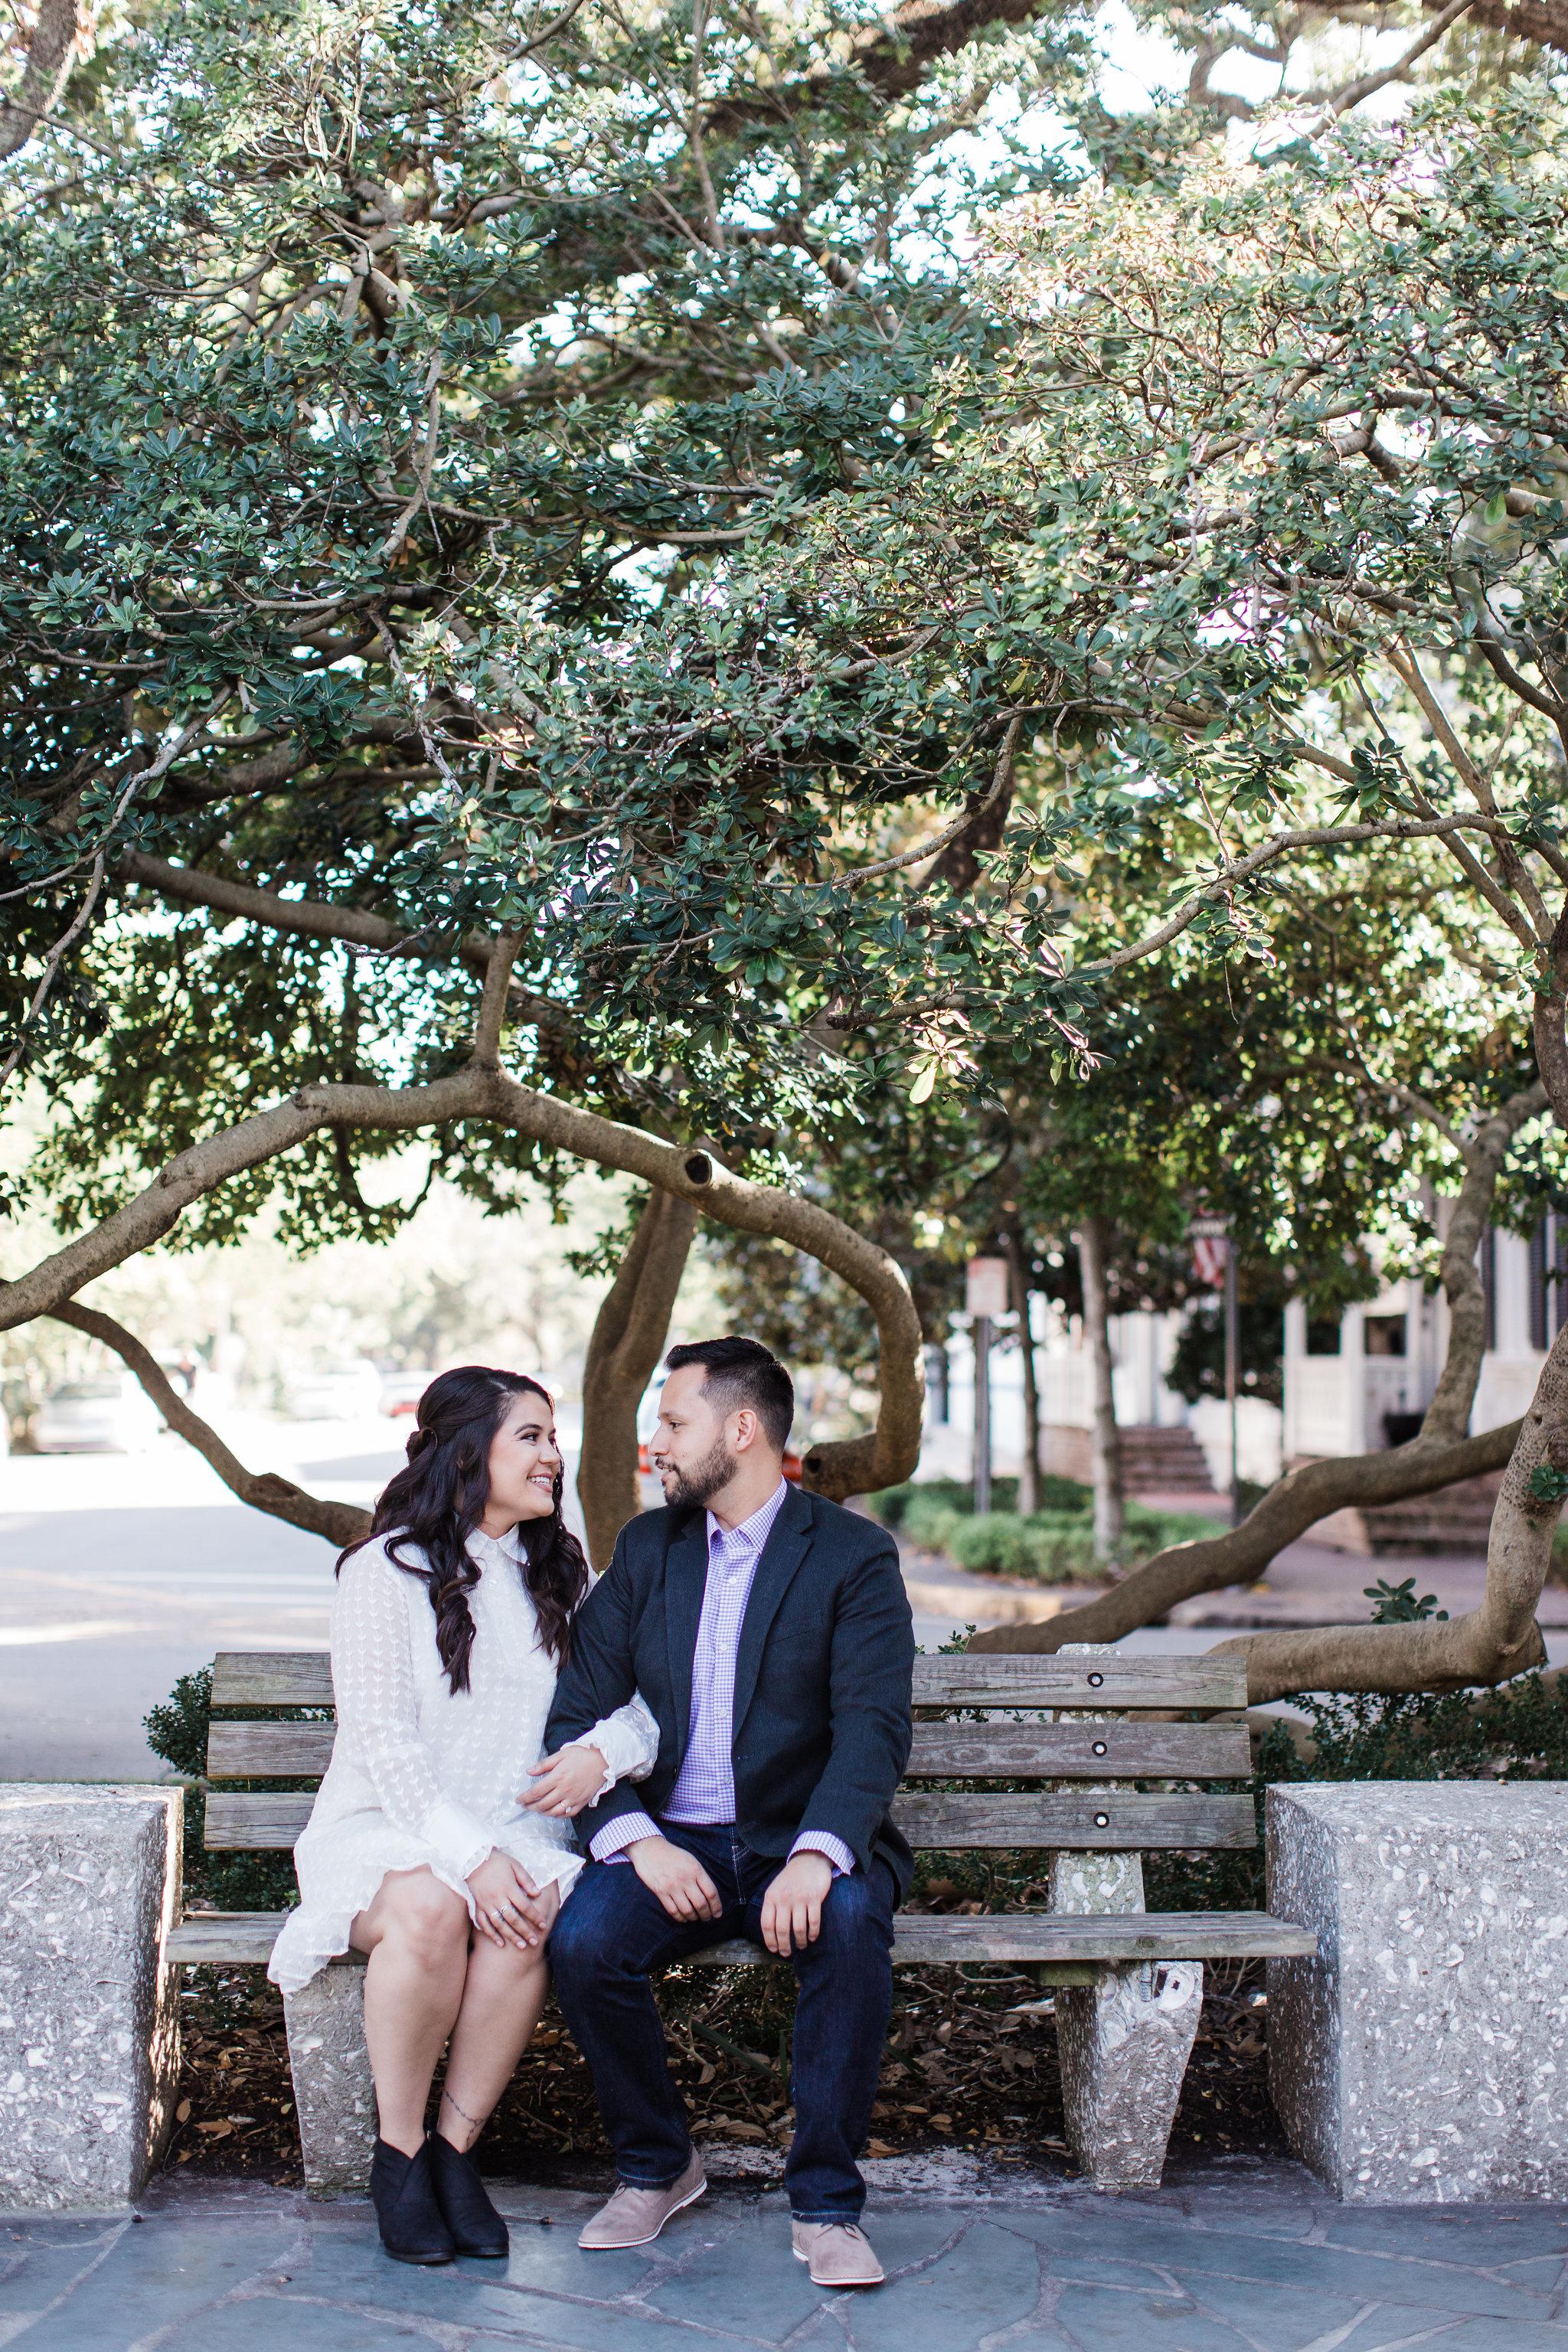 apt-b-photography-Savannah-wedding-photographer-savannah-engagement-photographer-historic-savannah-engagement-savannah-weddings-hilton-head-wedding-photographer-hilton-head-engagement-2.jpg